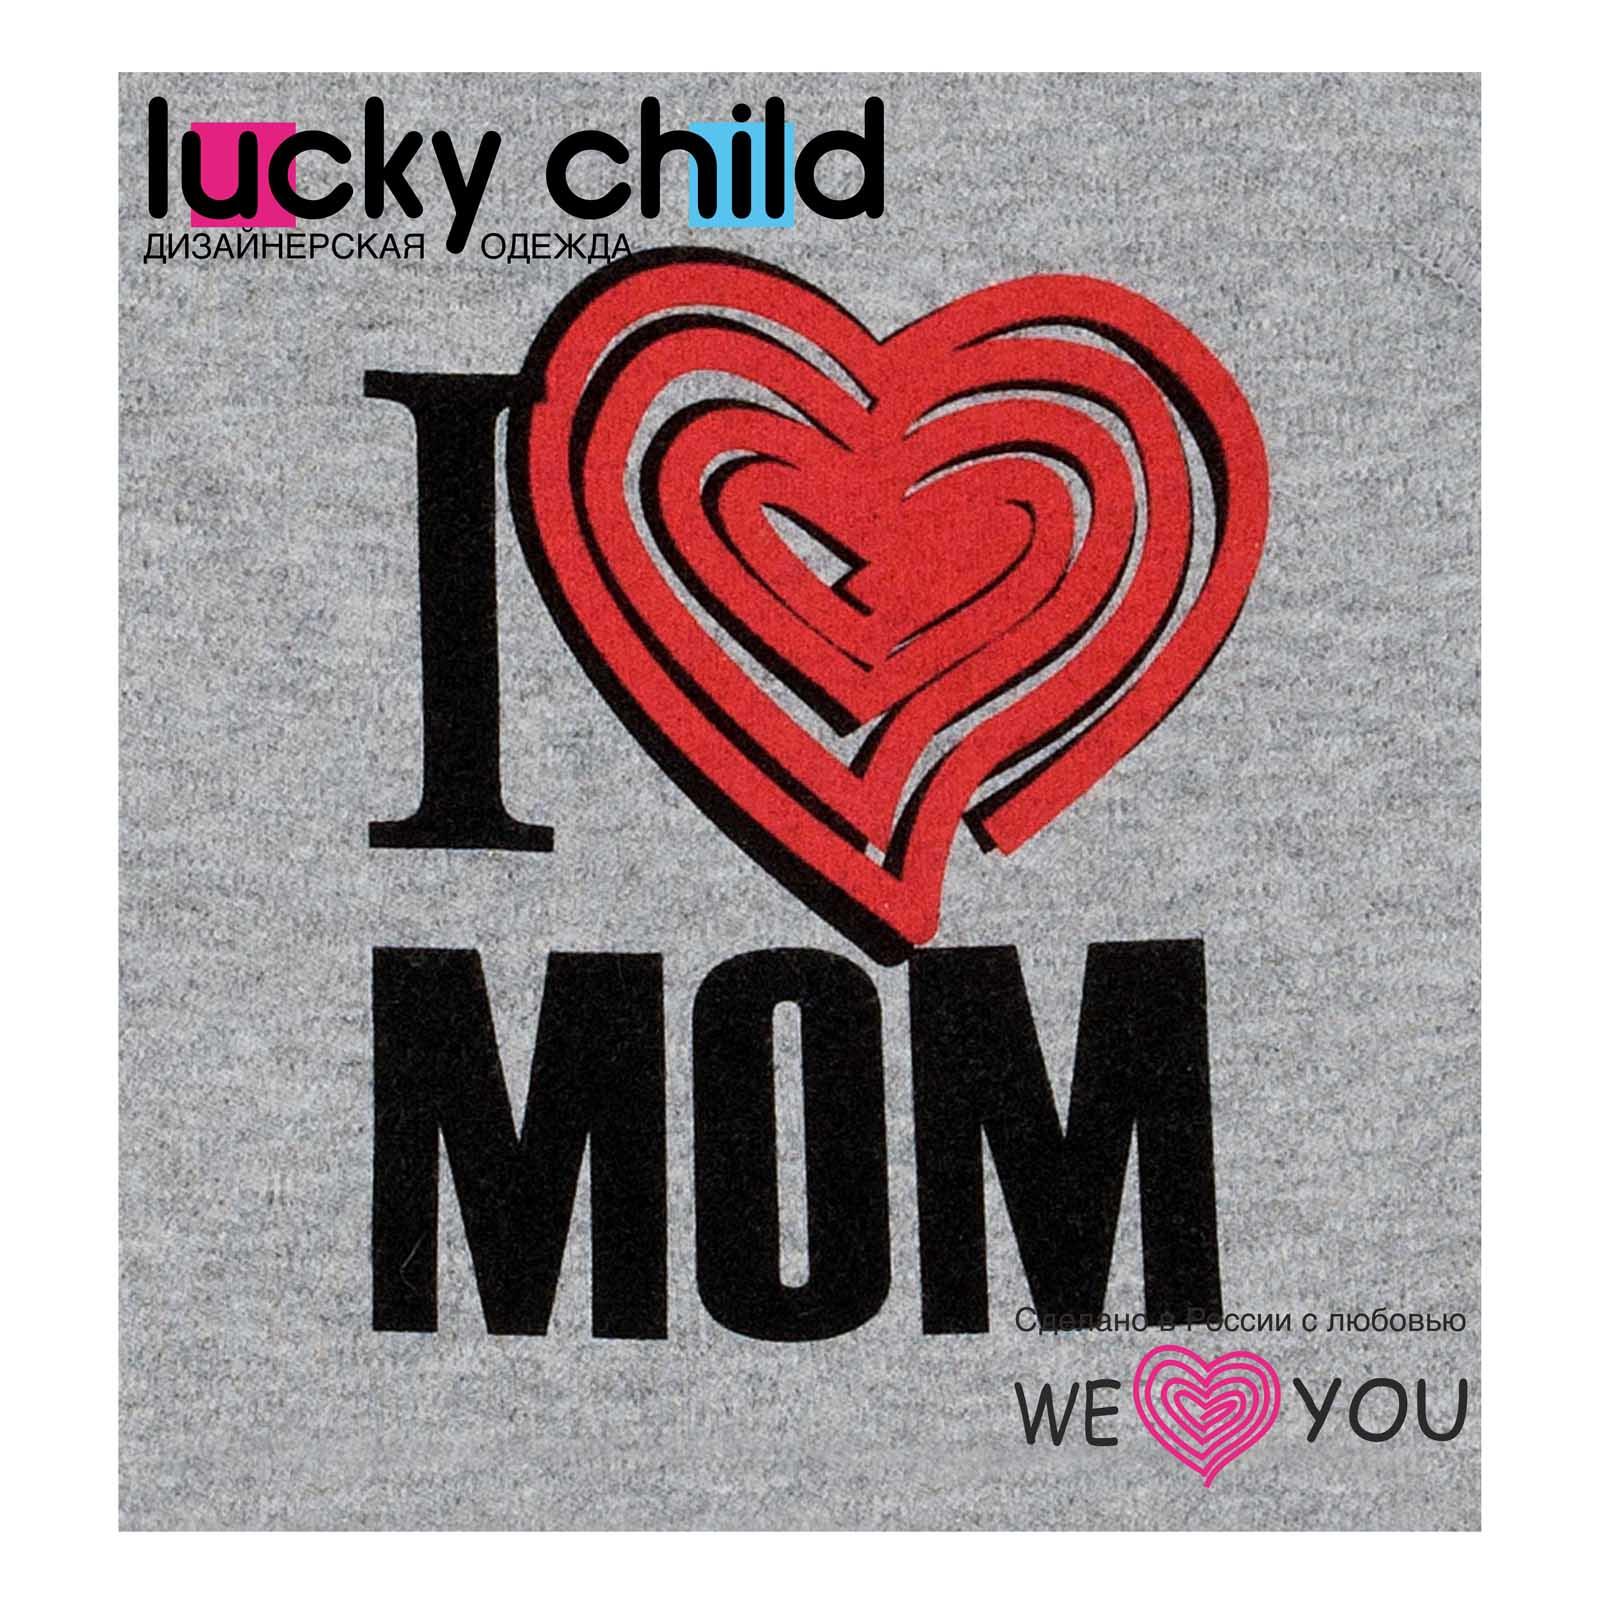 "Распашонка Lucky Child ""Я люблю маму"" размер 62"